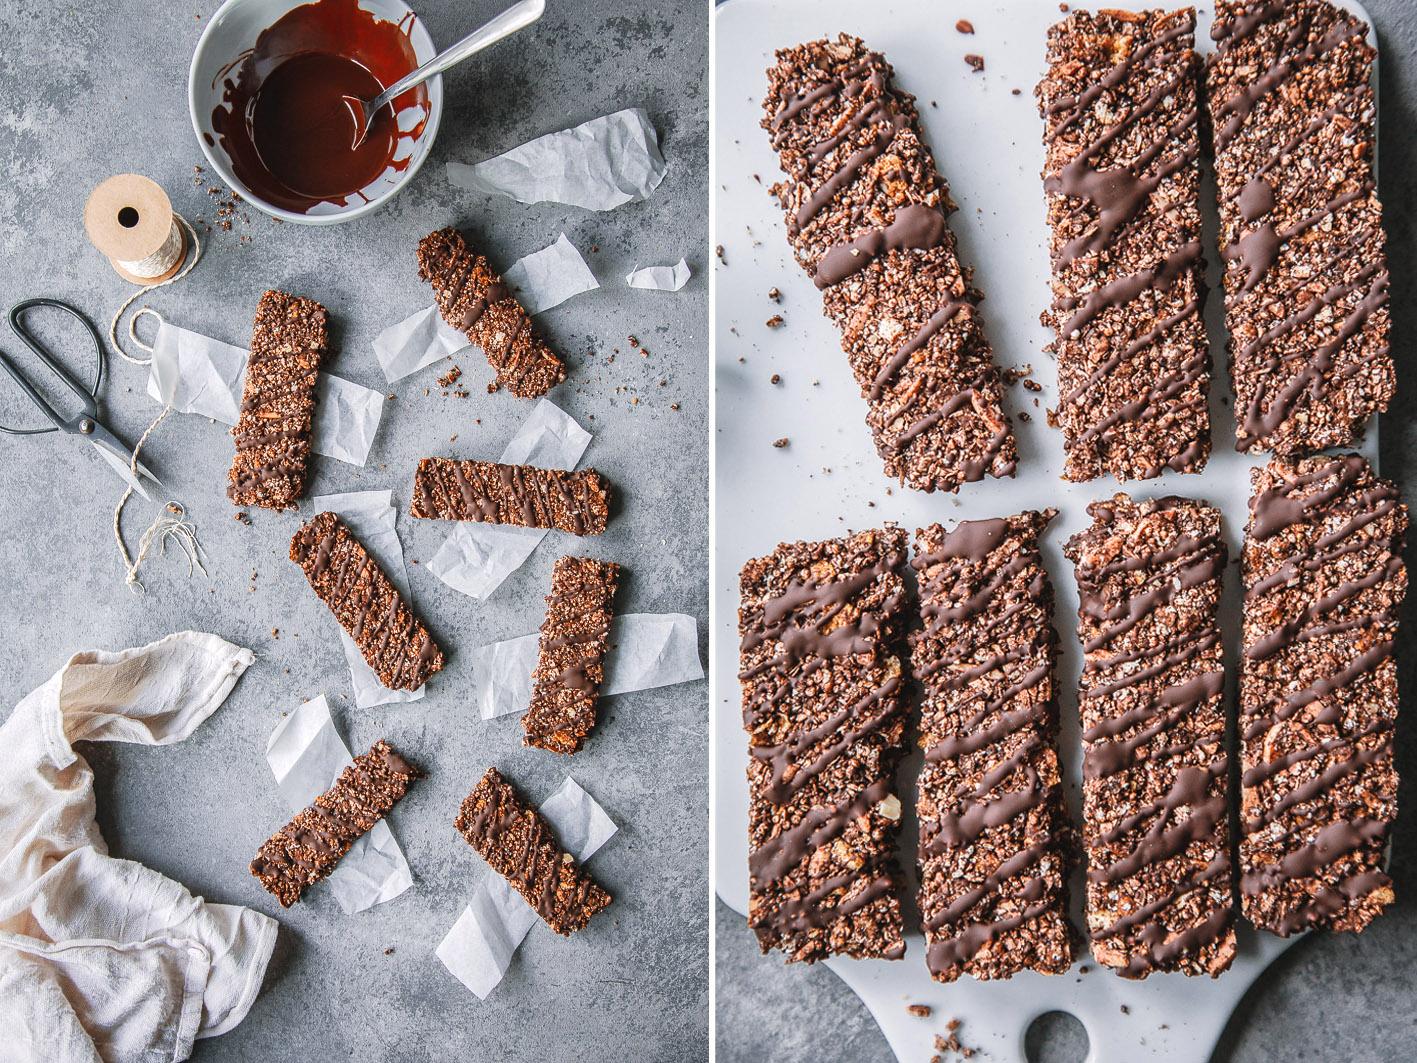 Knusper-Müsliriegel mit Schokolade